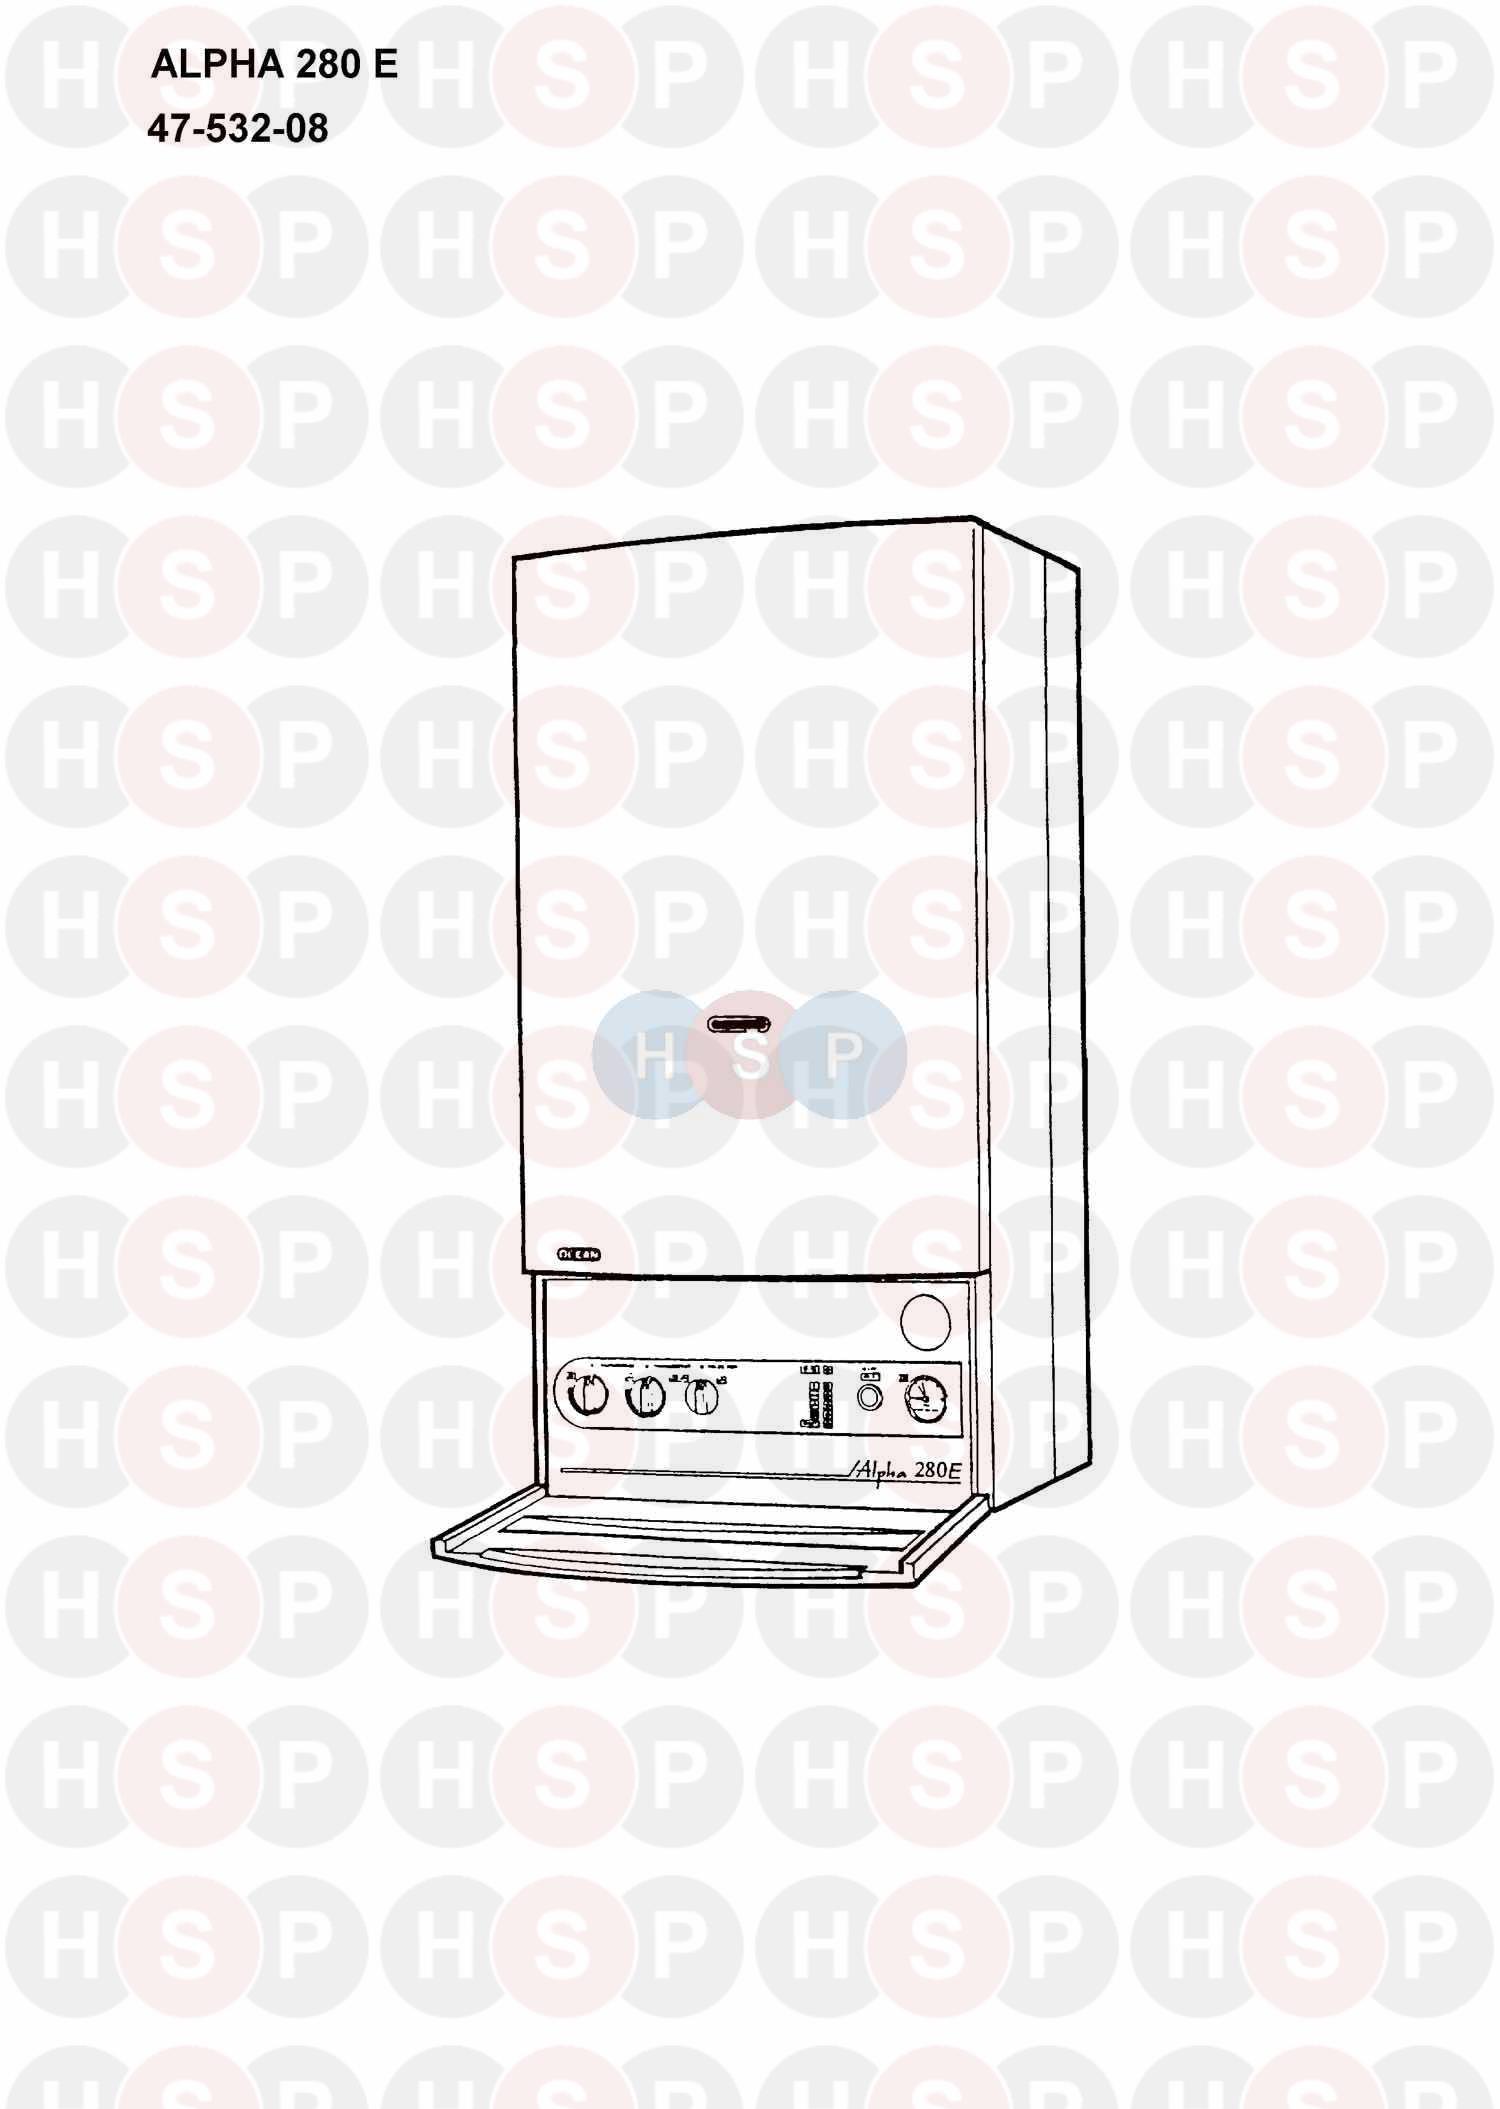 Alpha 280 E Boiler Diagram Appliance Overview Heating